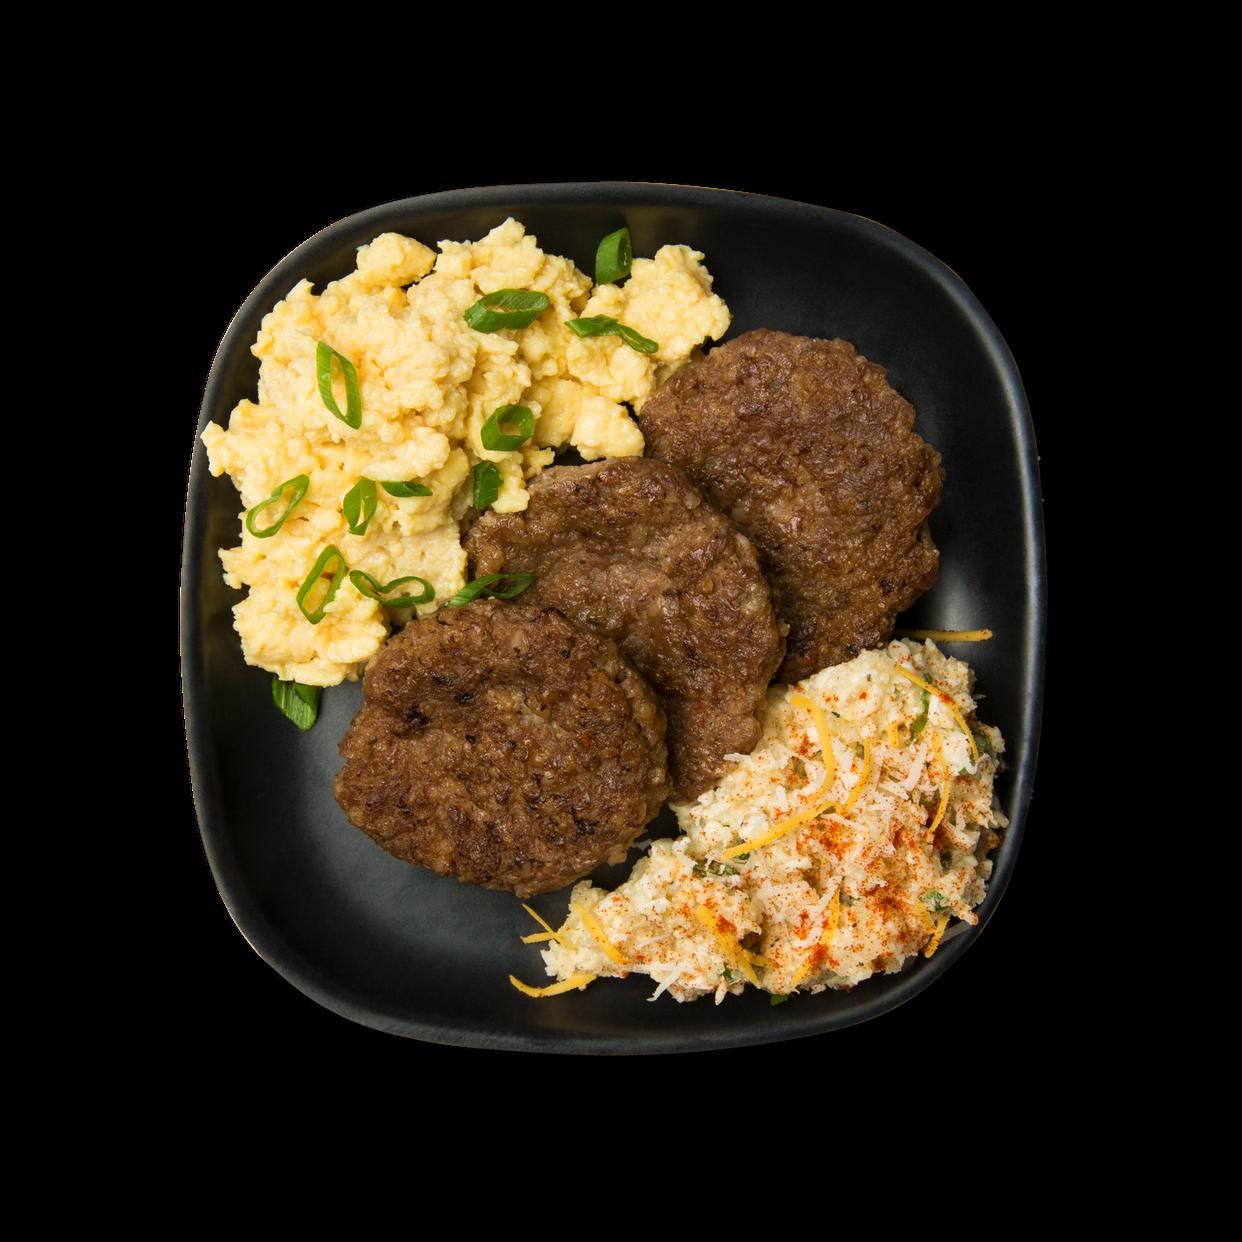 Breakfast Platter - Snap Kitchen - Gluten Free